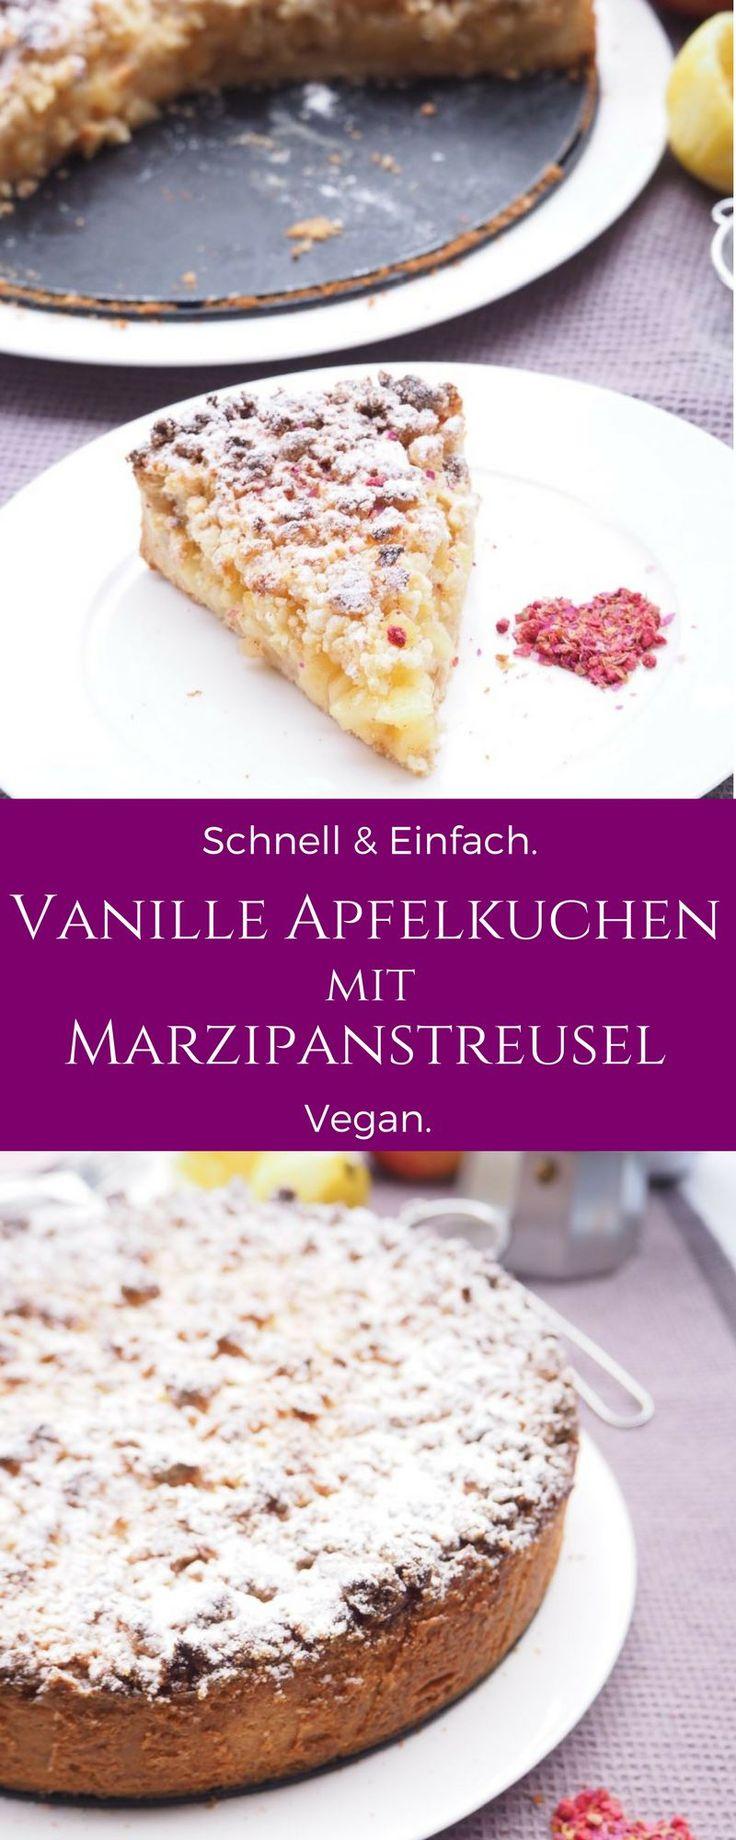 743 best vegane rezepte s kuchen torten kekse images on pinterest. Black Bedroom Furniture Sets. Home Design Ideas